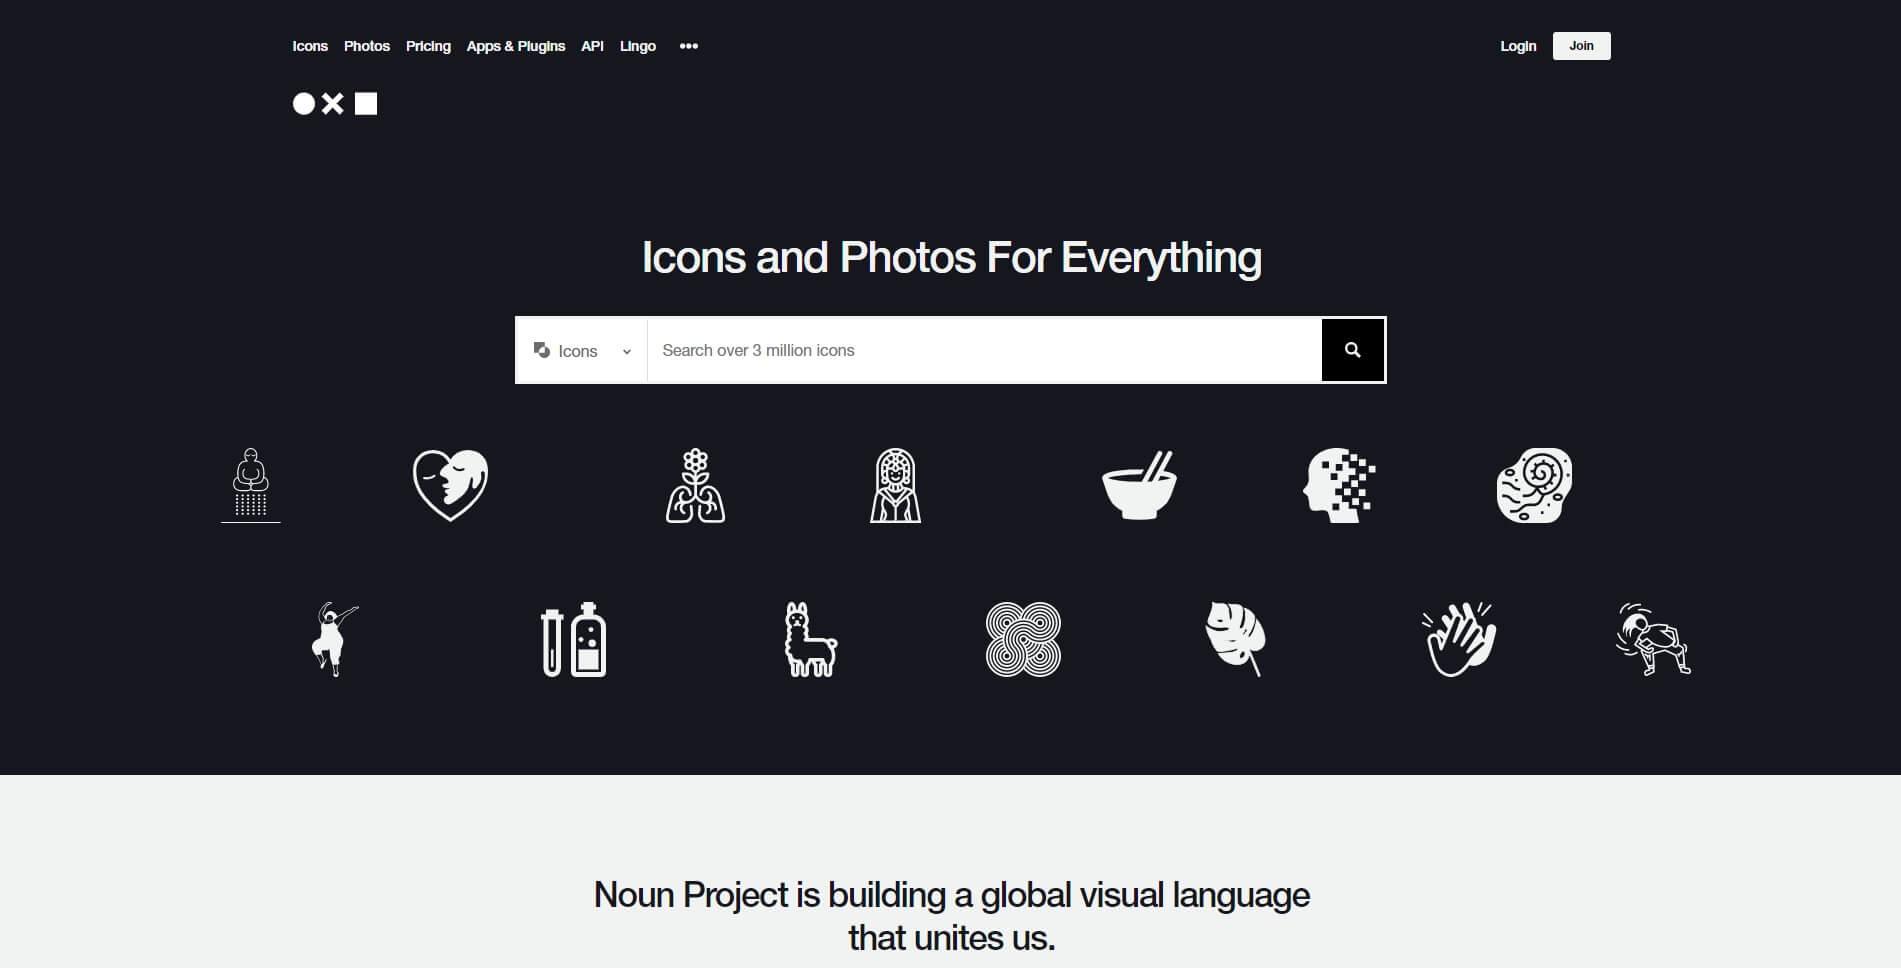 Gratis stockfoto's Noun Project